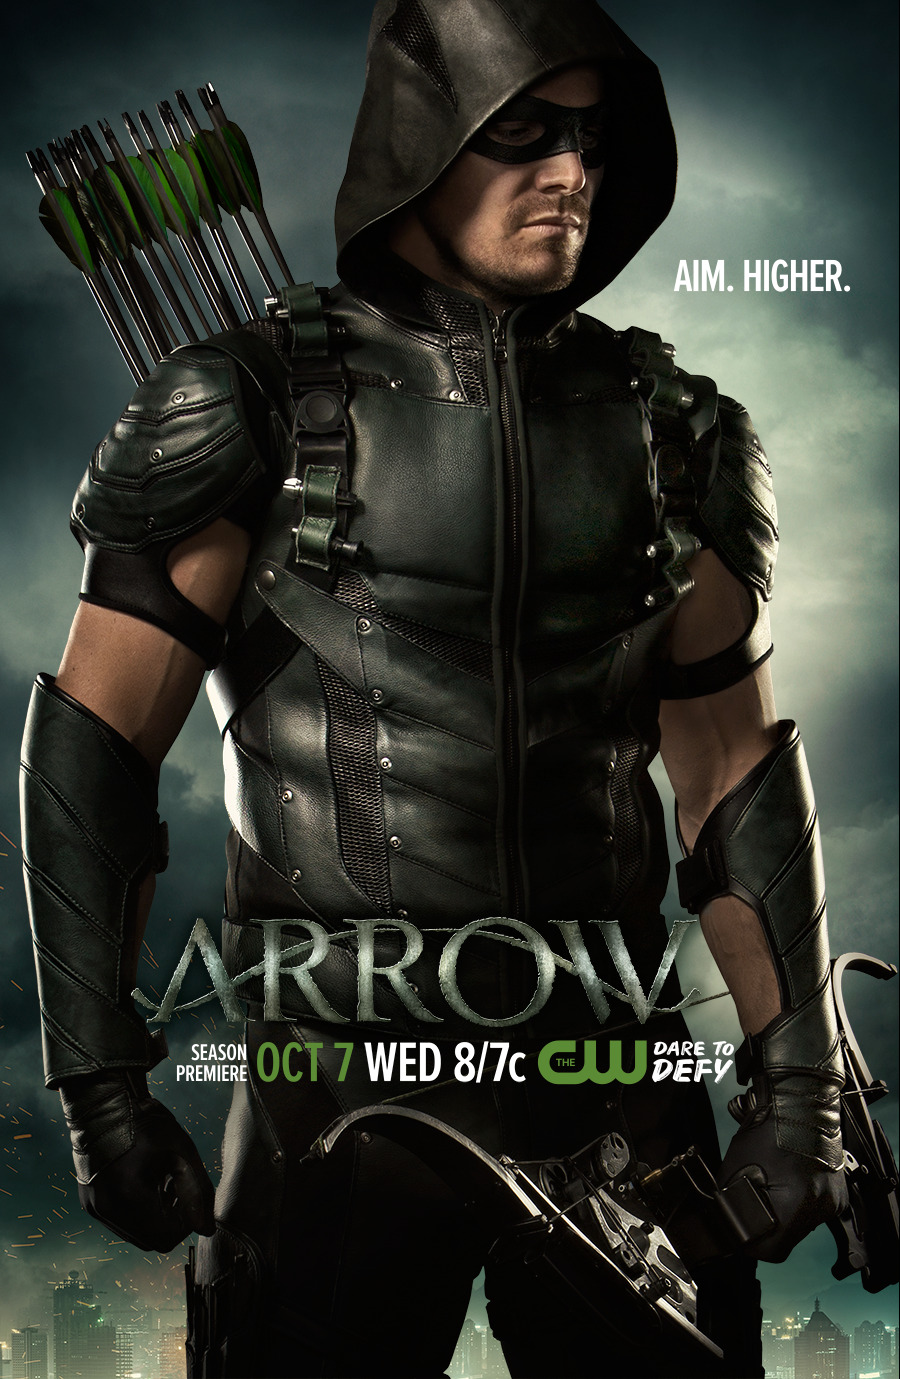 Arrow season 4 poster - Aim. Higher..png